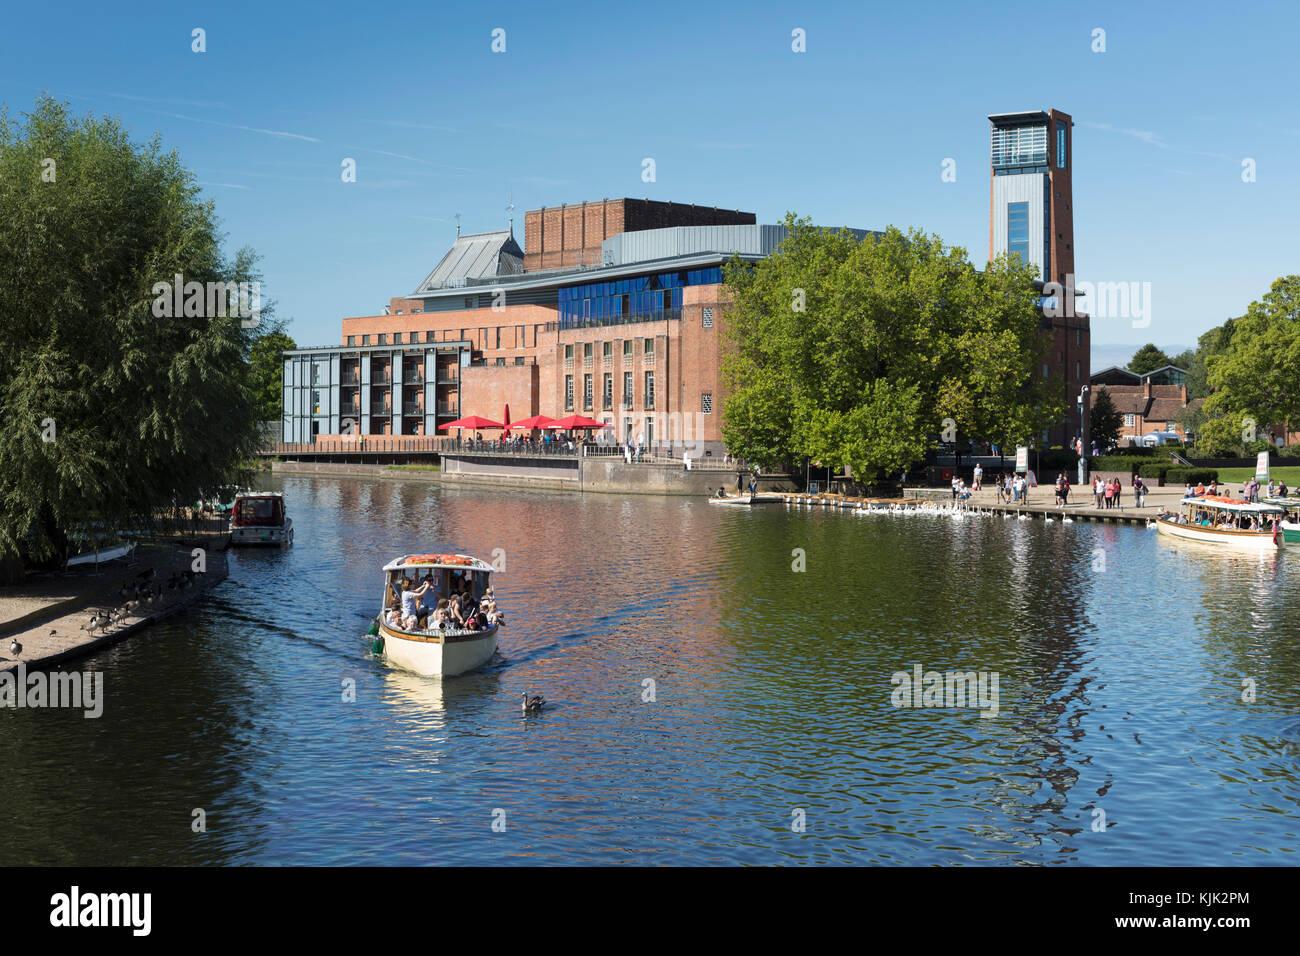 Tour boat cruising past the Royal Shakespeare Theatre on the River Avon, Stratford-upon-Avon, Warwickshire, England, - Stock Image